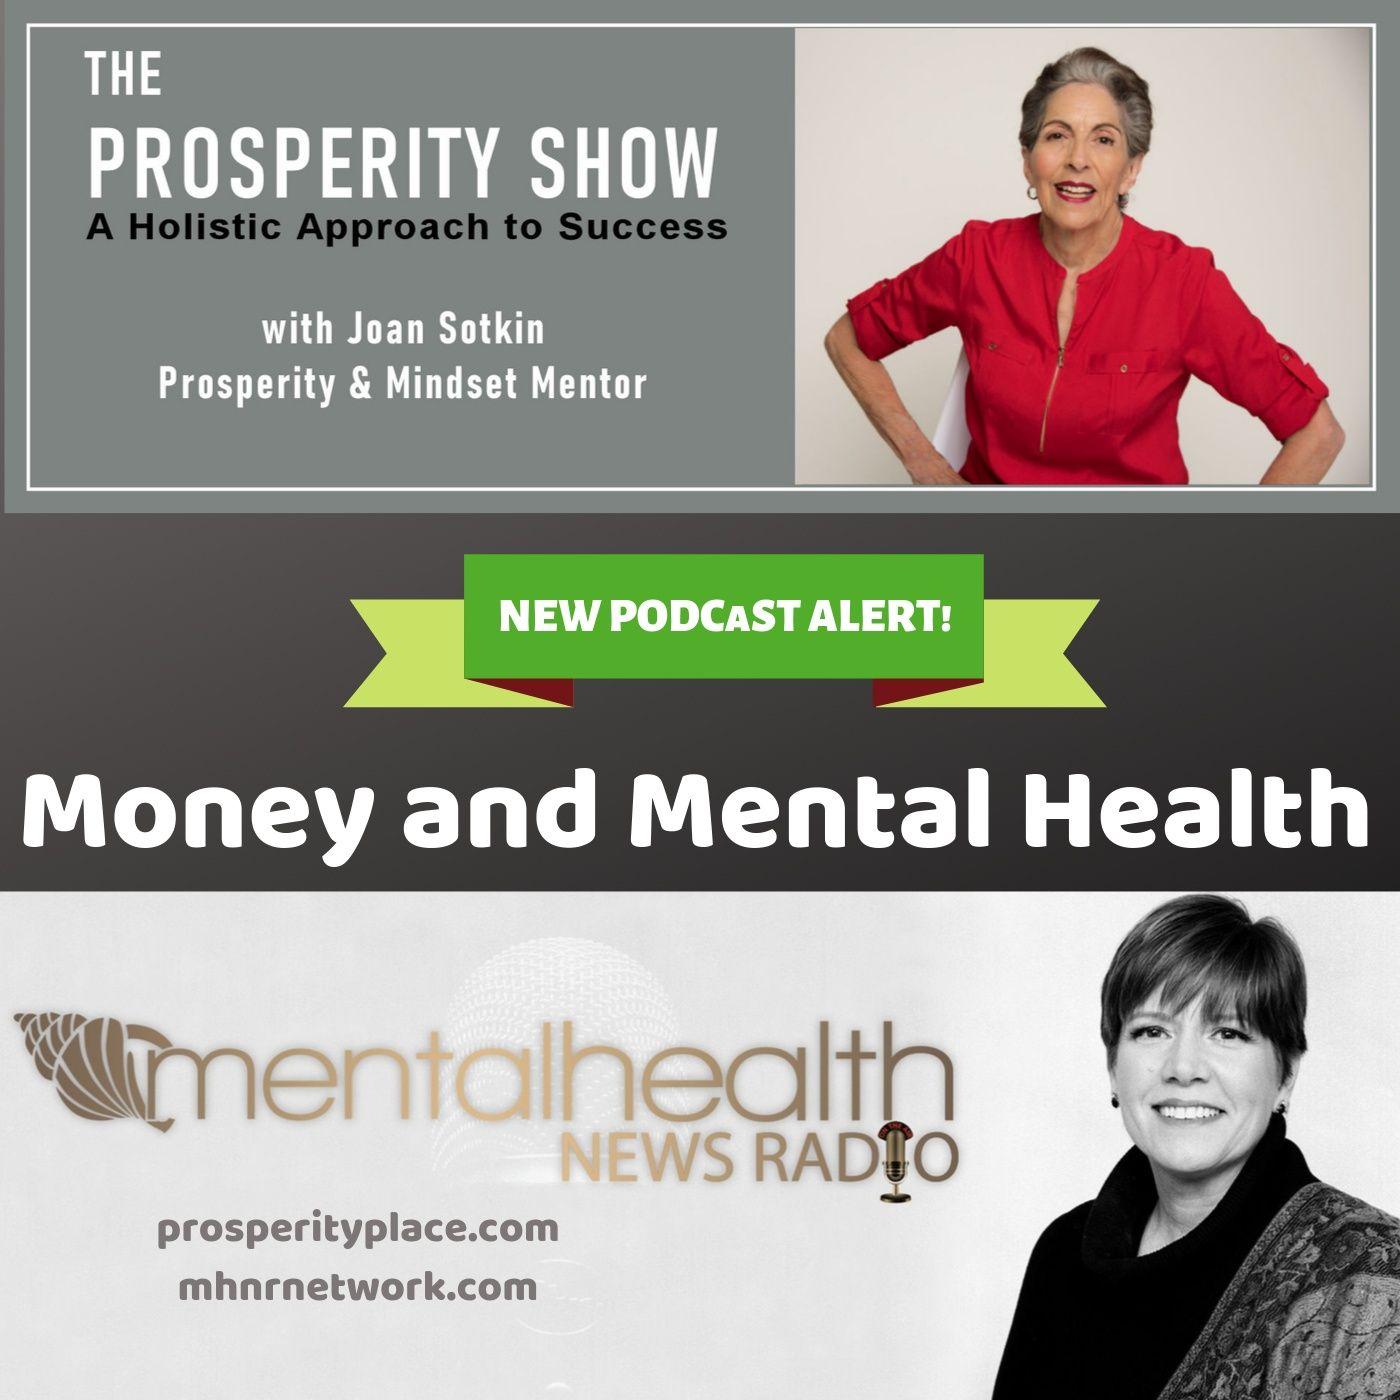 Mental Health News Radio - Money and Mental Health with Joan Sotkin